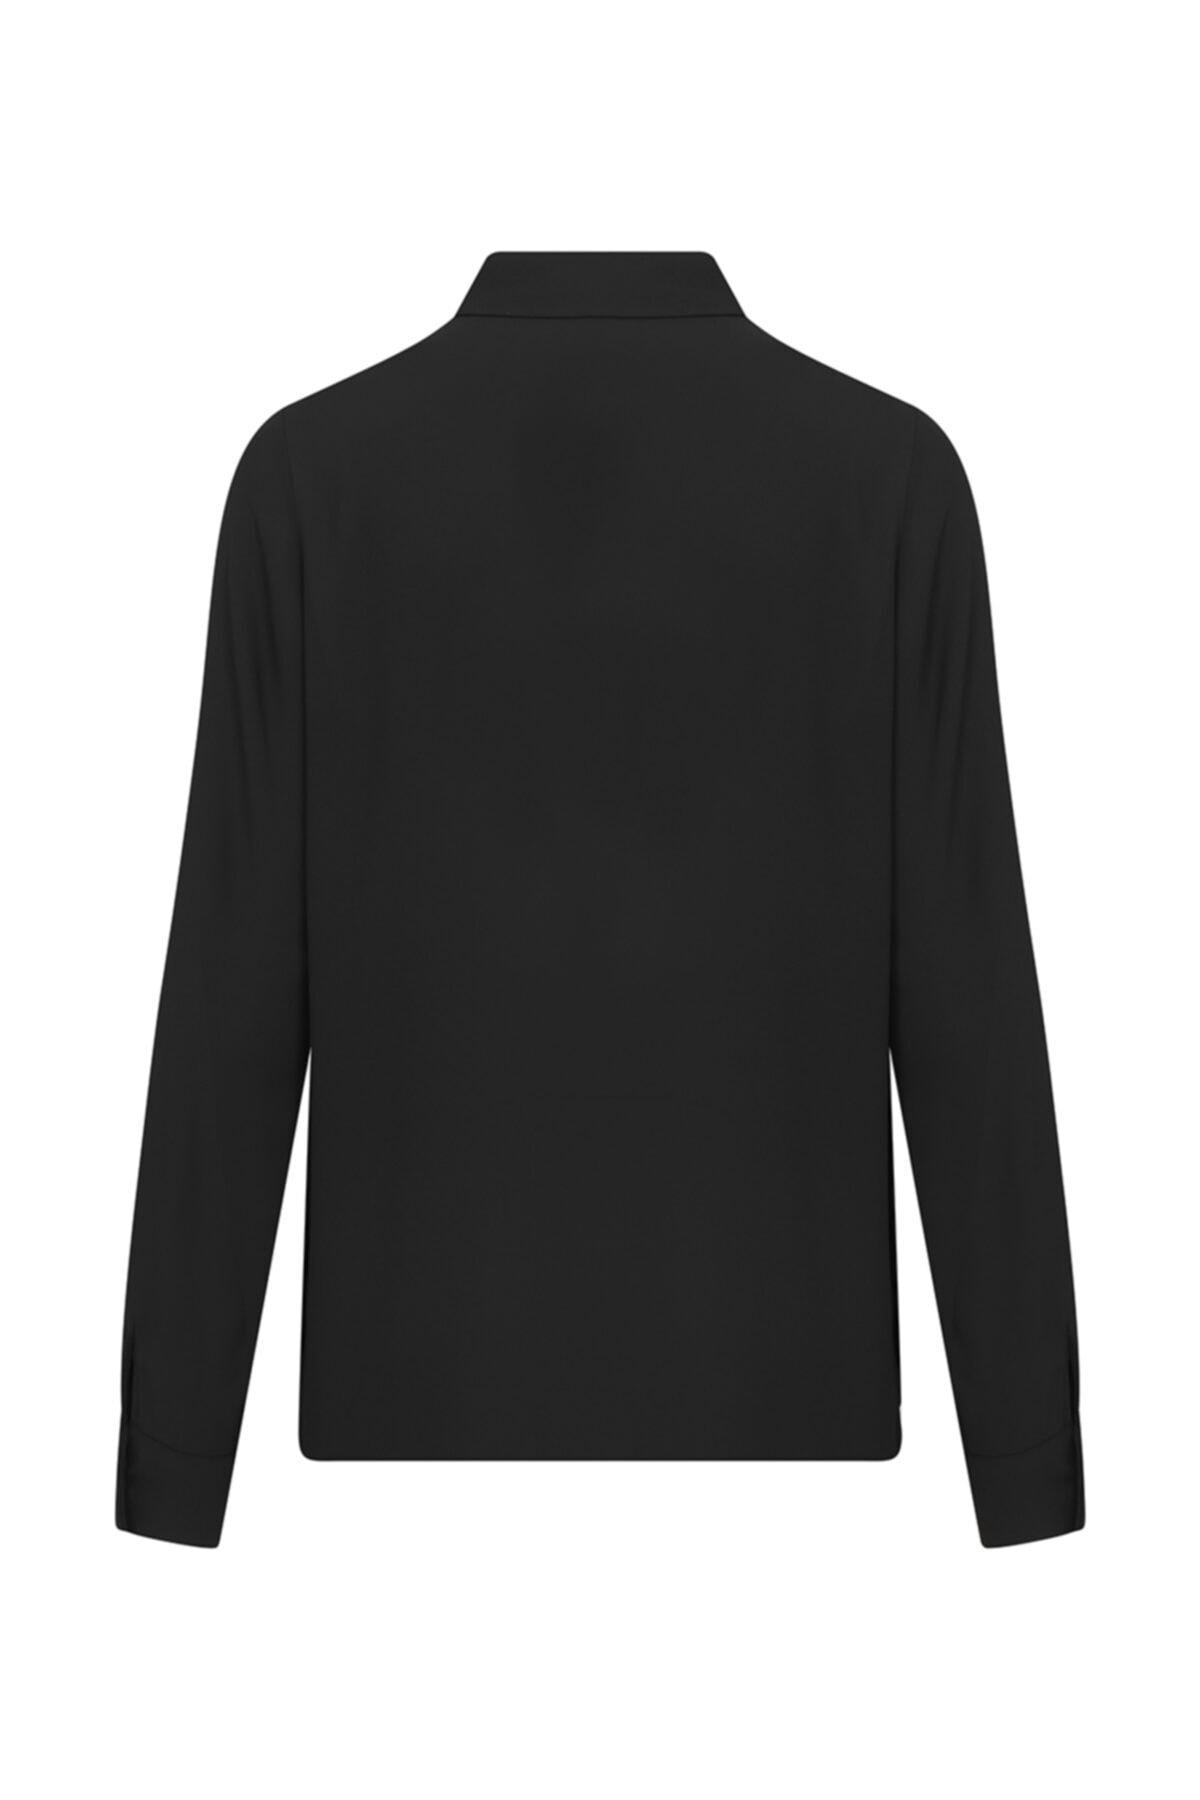 W Collection Kadın Siyah Cep Detaylı Gömlek 2